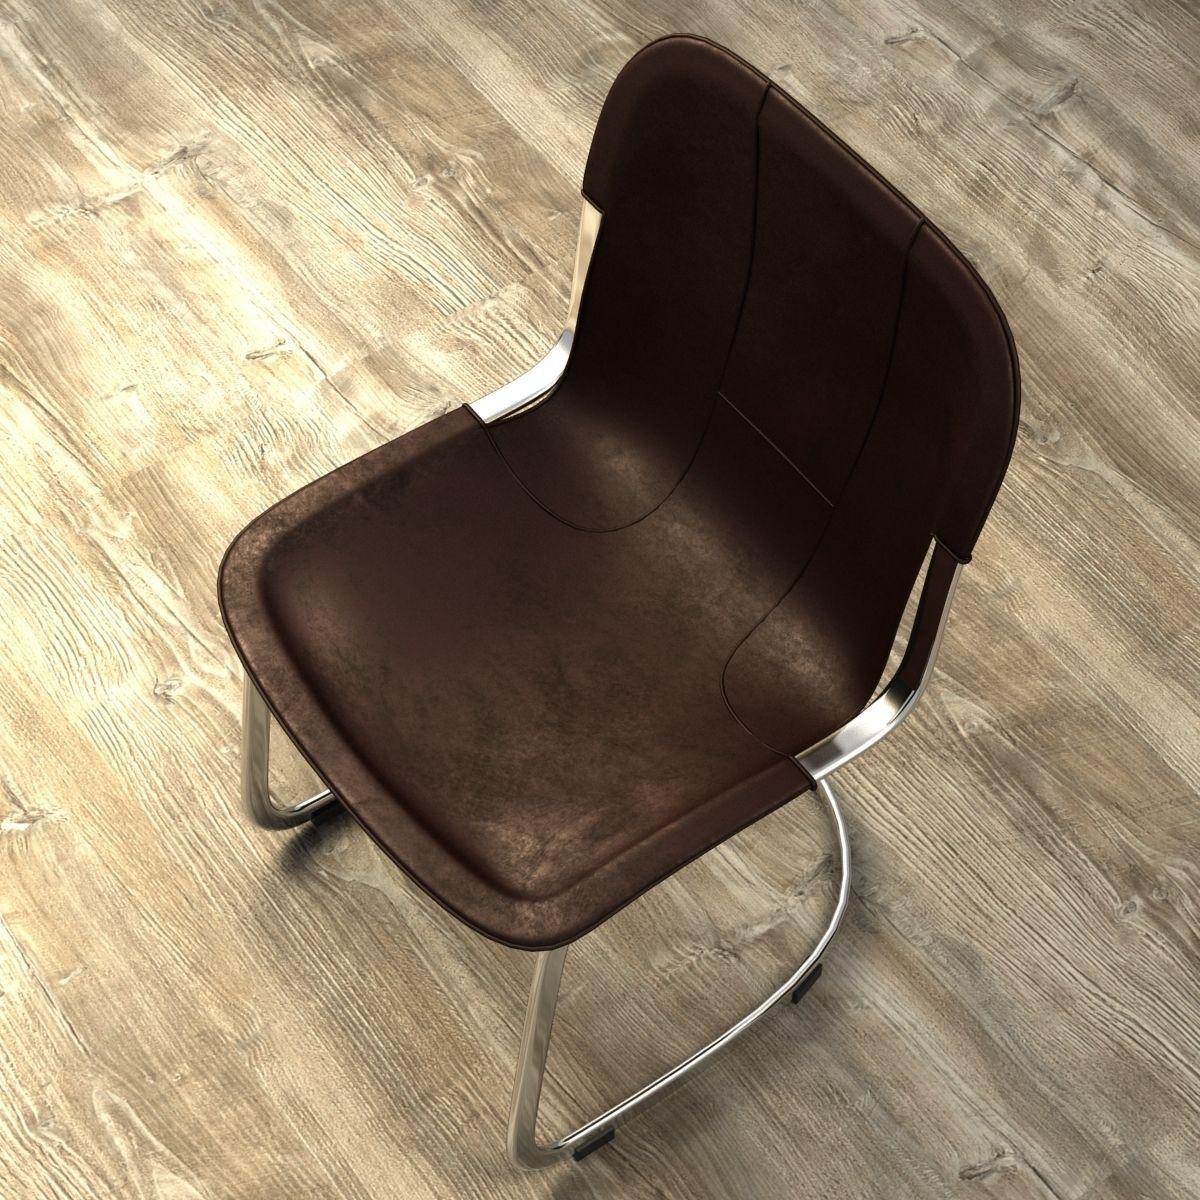 Restoration Hardware Rizzo Leather Side Chair Model Max Obj Mtl S Fbx 6